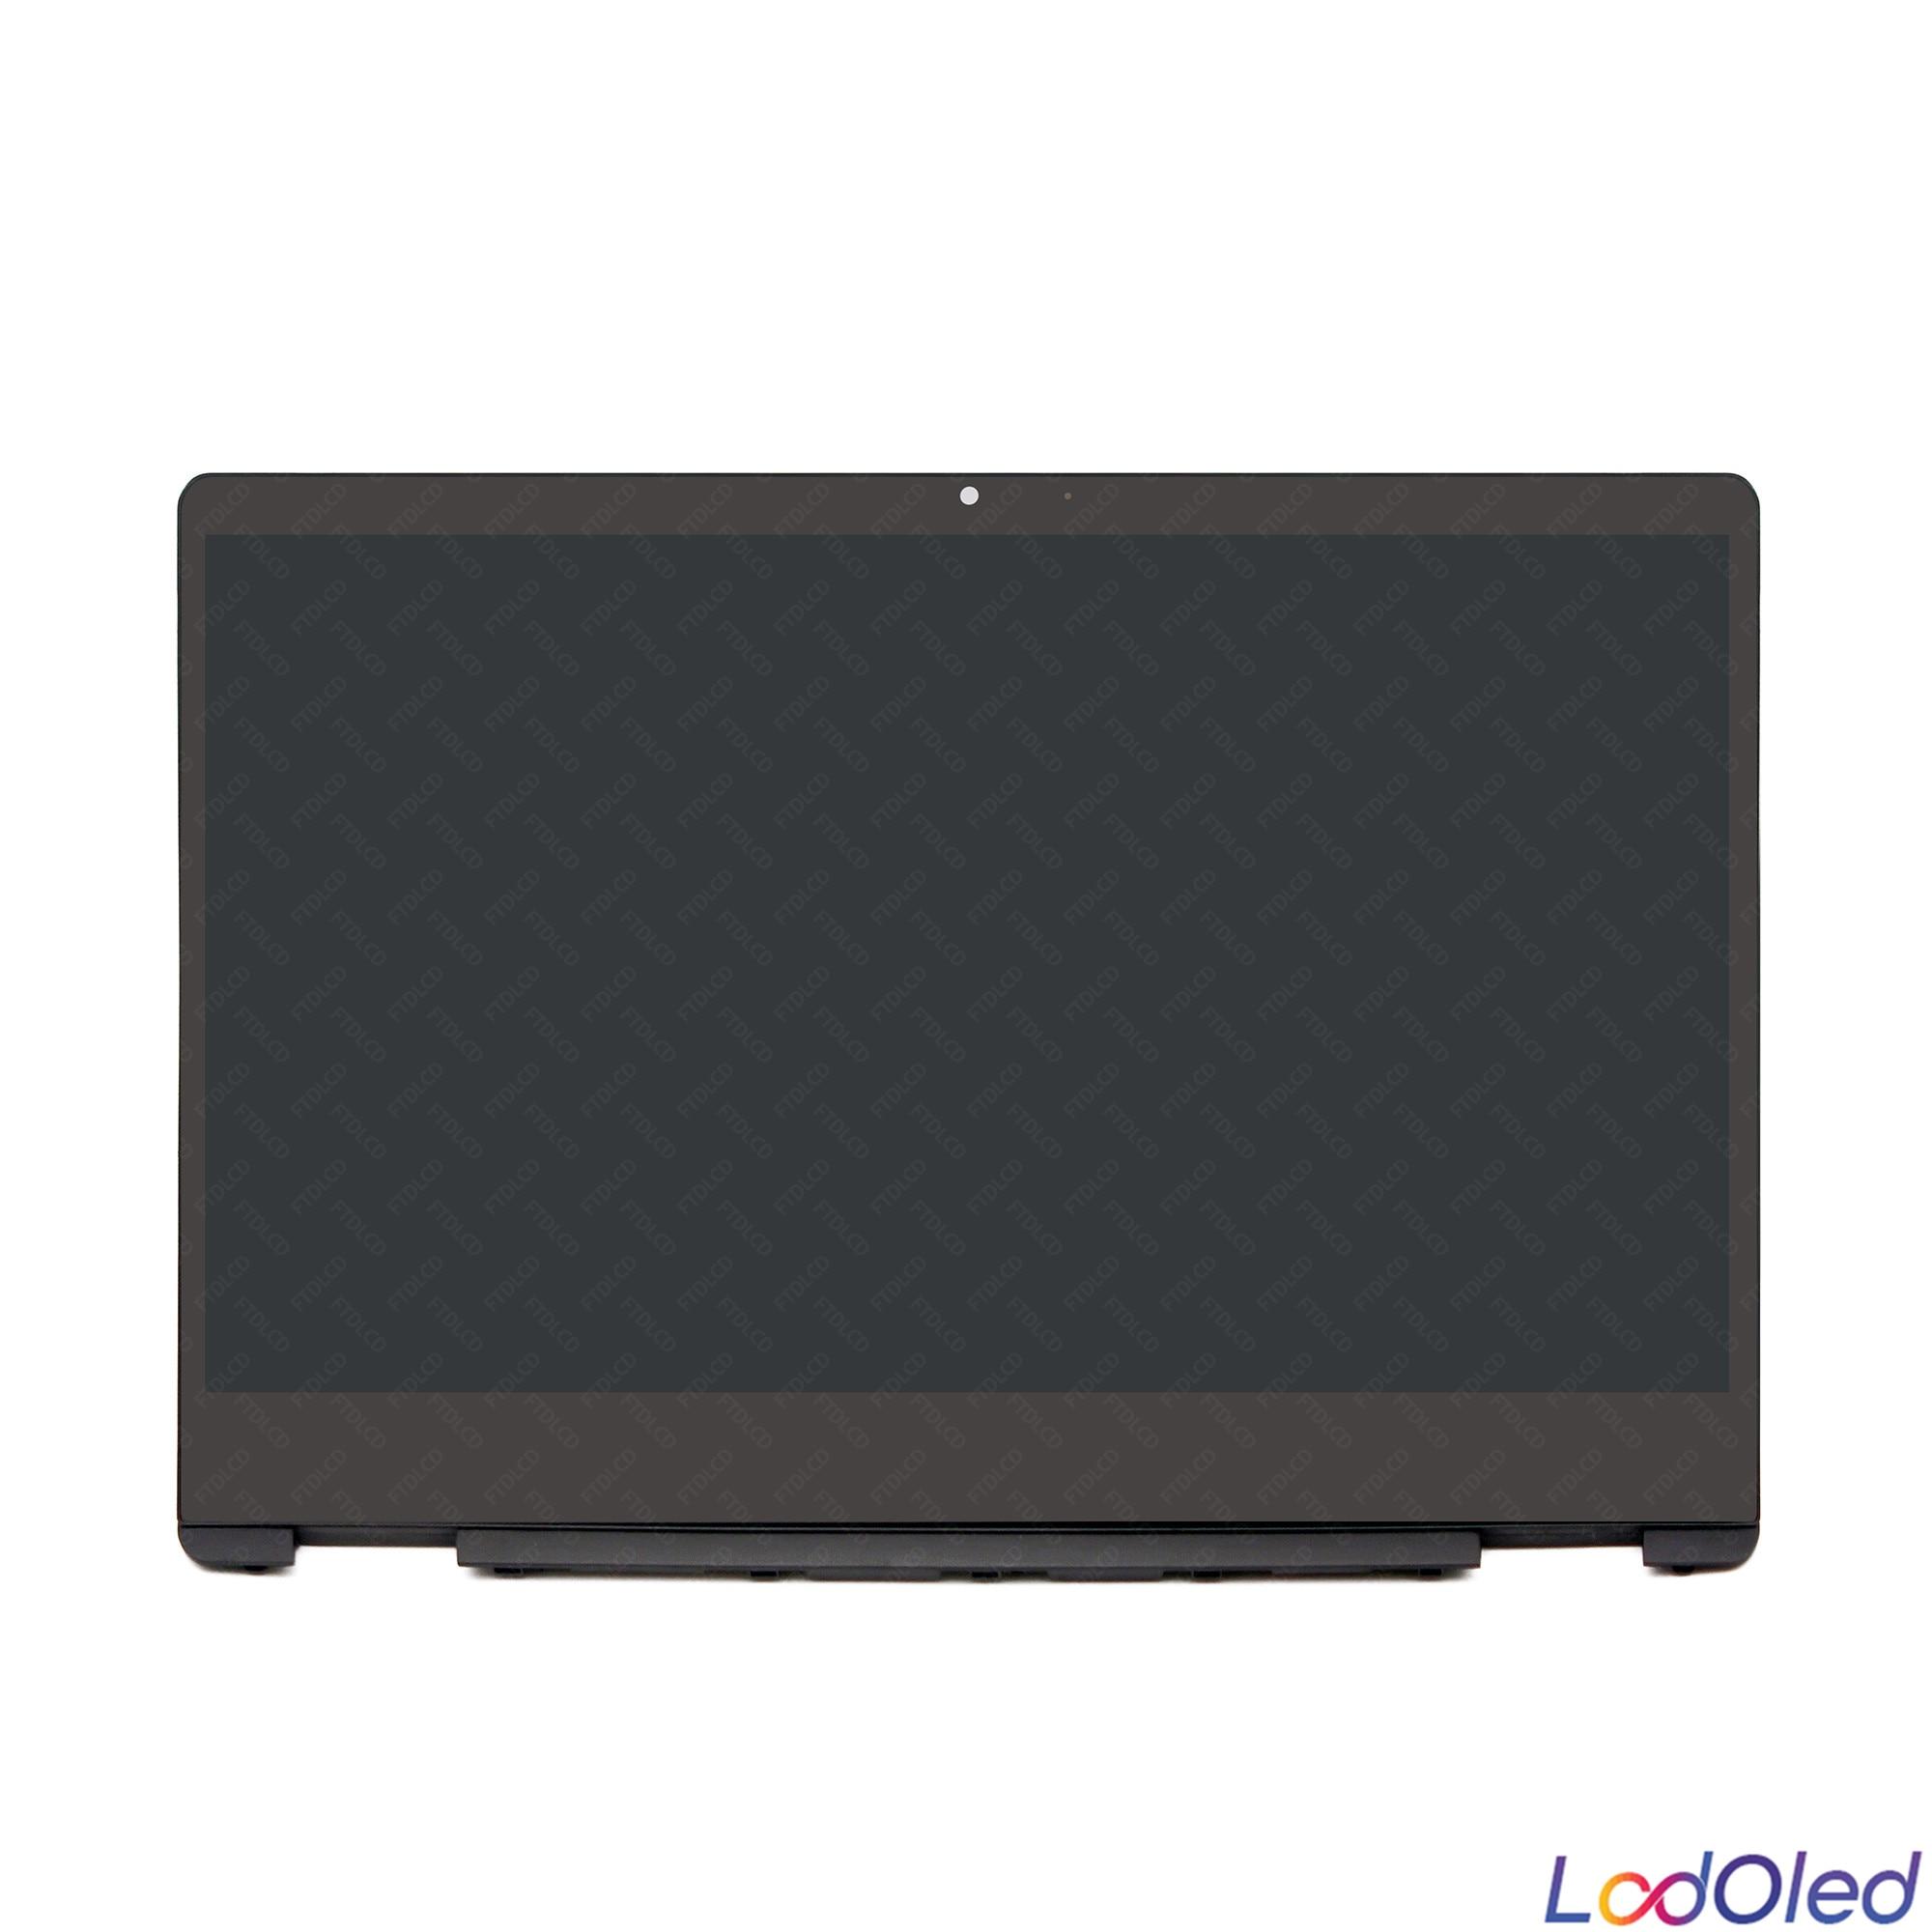 IPS LCD لمس الشاشة محول الأرقام زجاج الجمعية NV140FHM-N4K LP140WFA.SPD3 B140XTN07.2 ل HP جناح x360 14 dh سلسلة